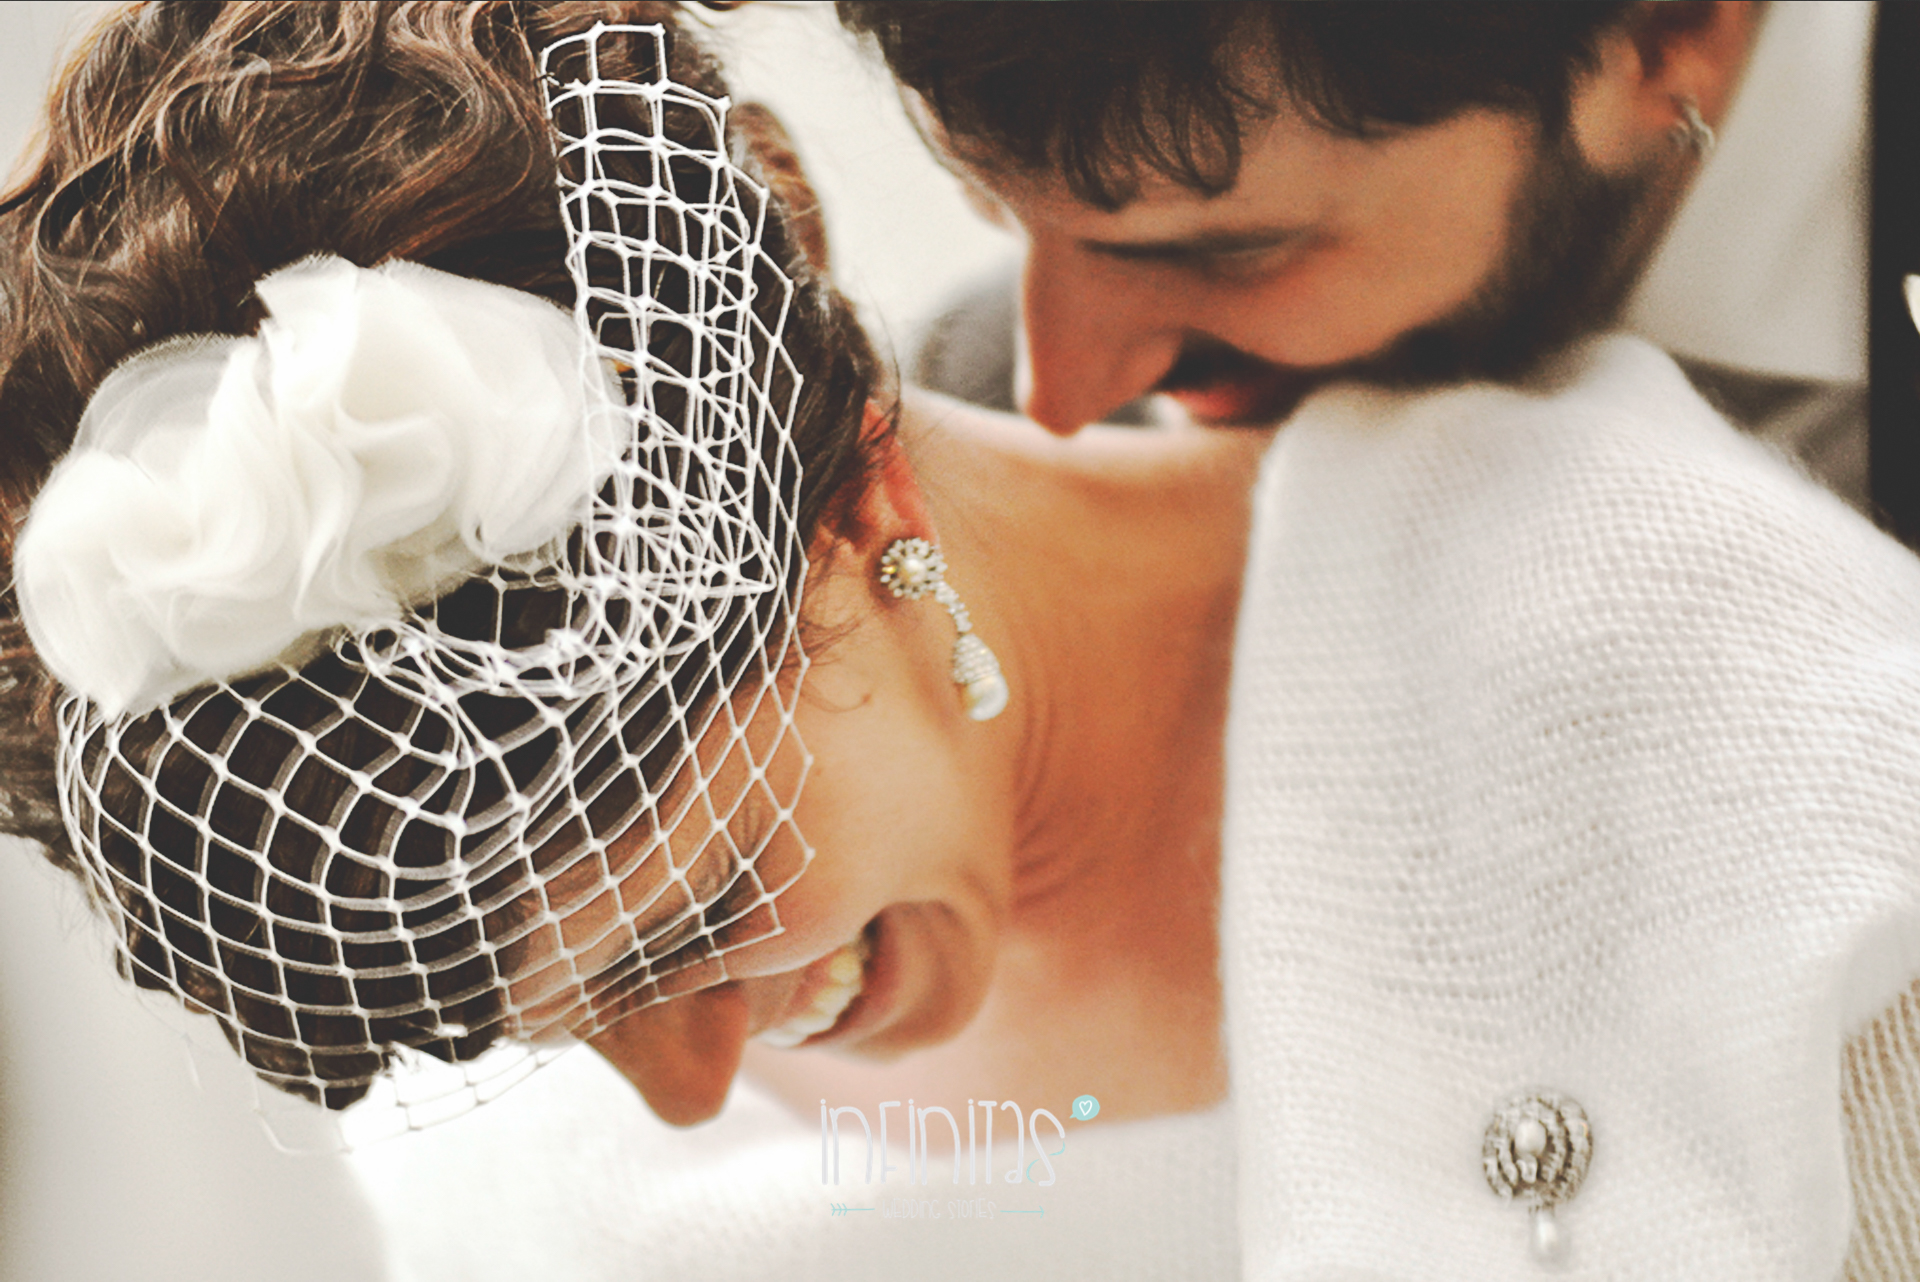 infinitas-sposa-marito-abbraccio